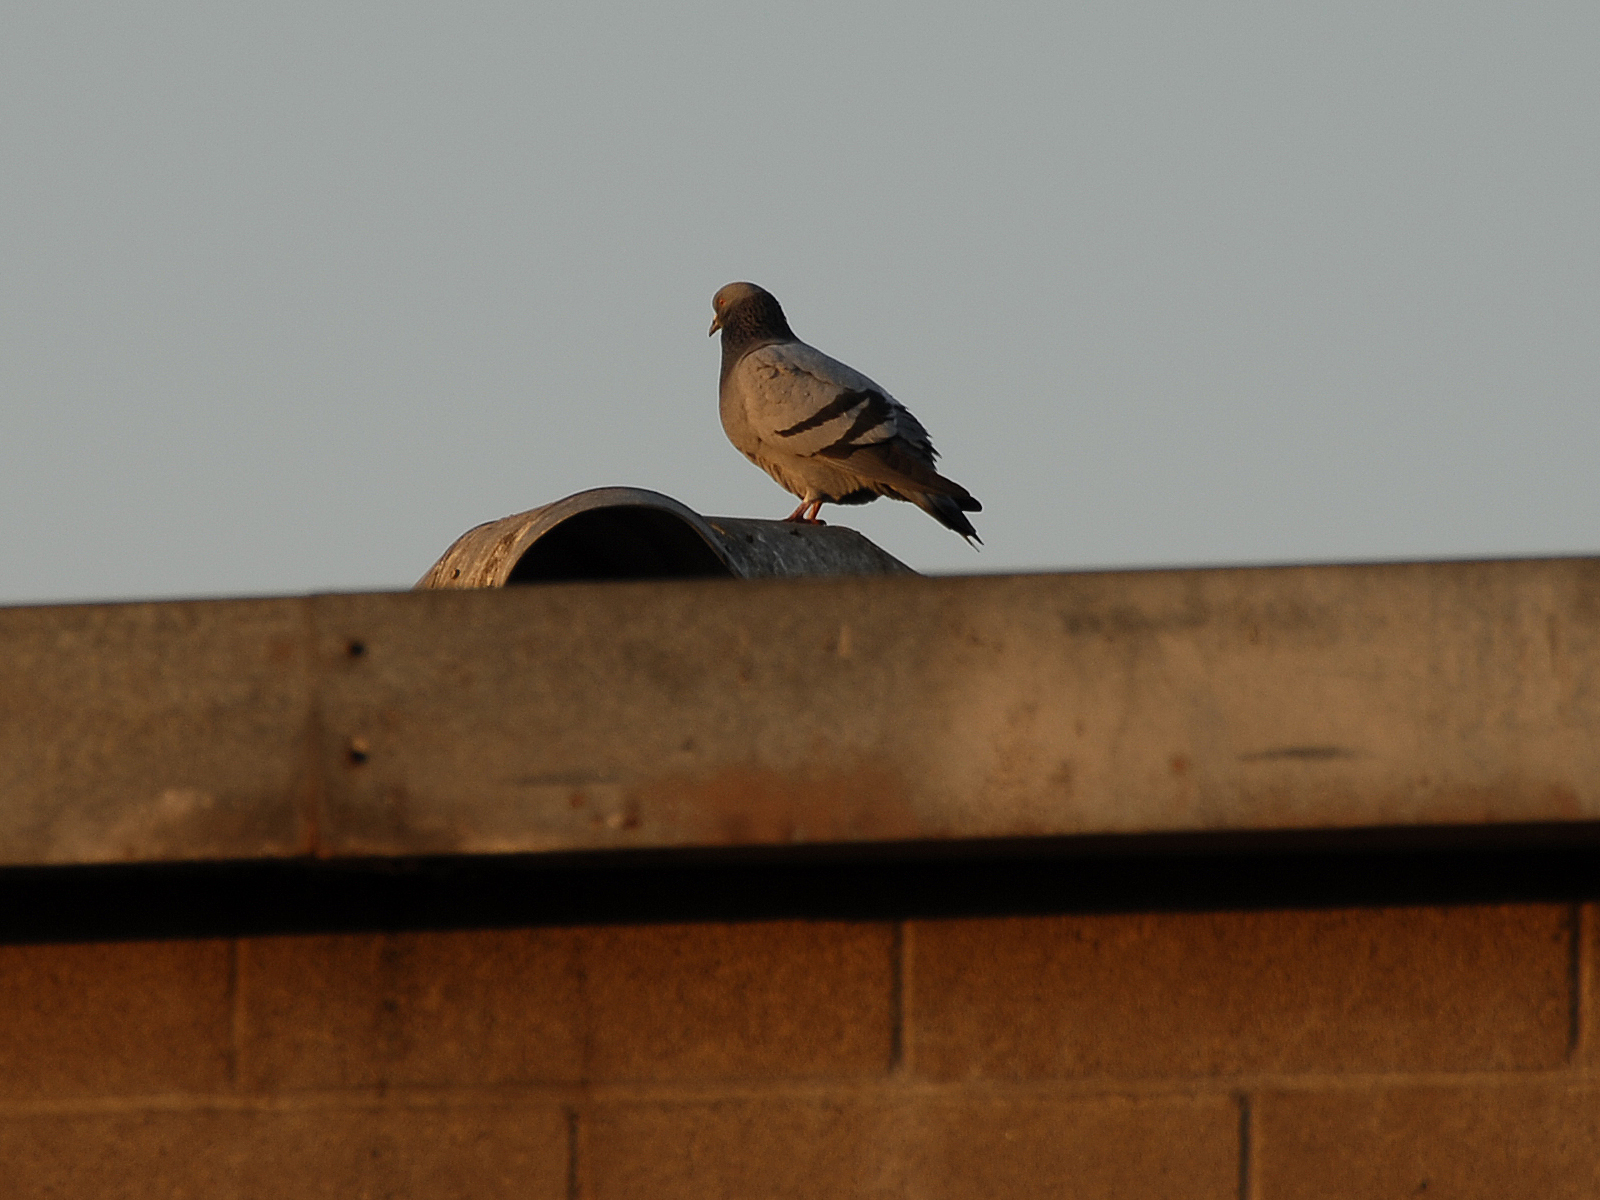 Pidgeon on a building photo